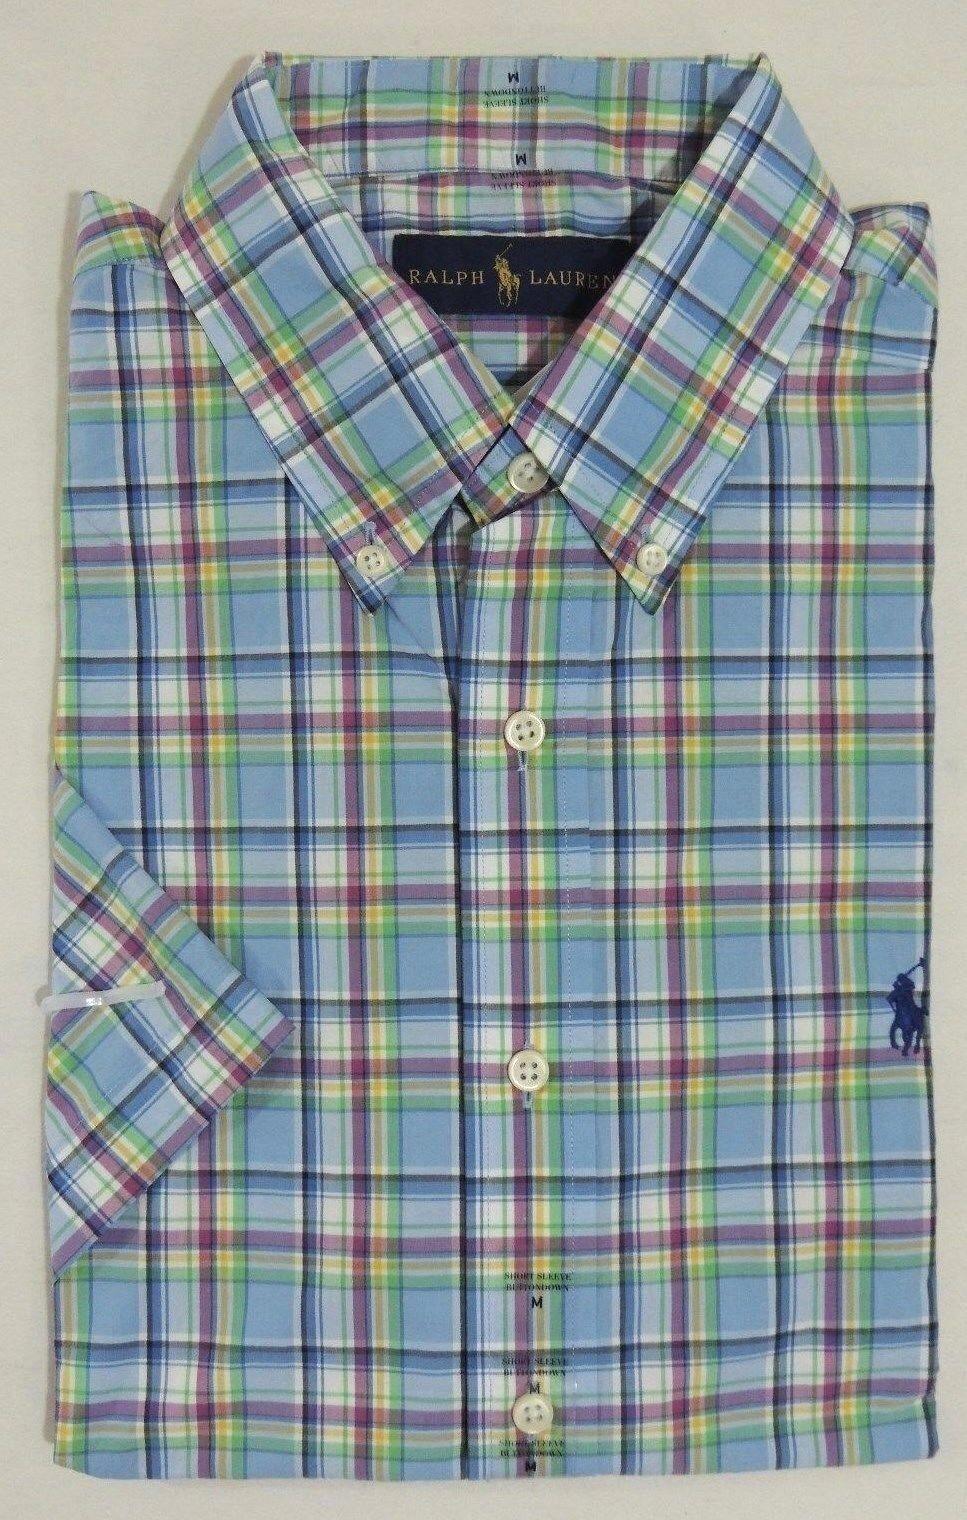 93ac3c46 Polo Ralph Lauren Mens Shirt Classic Fit Button Down Woven S Blue ...